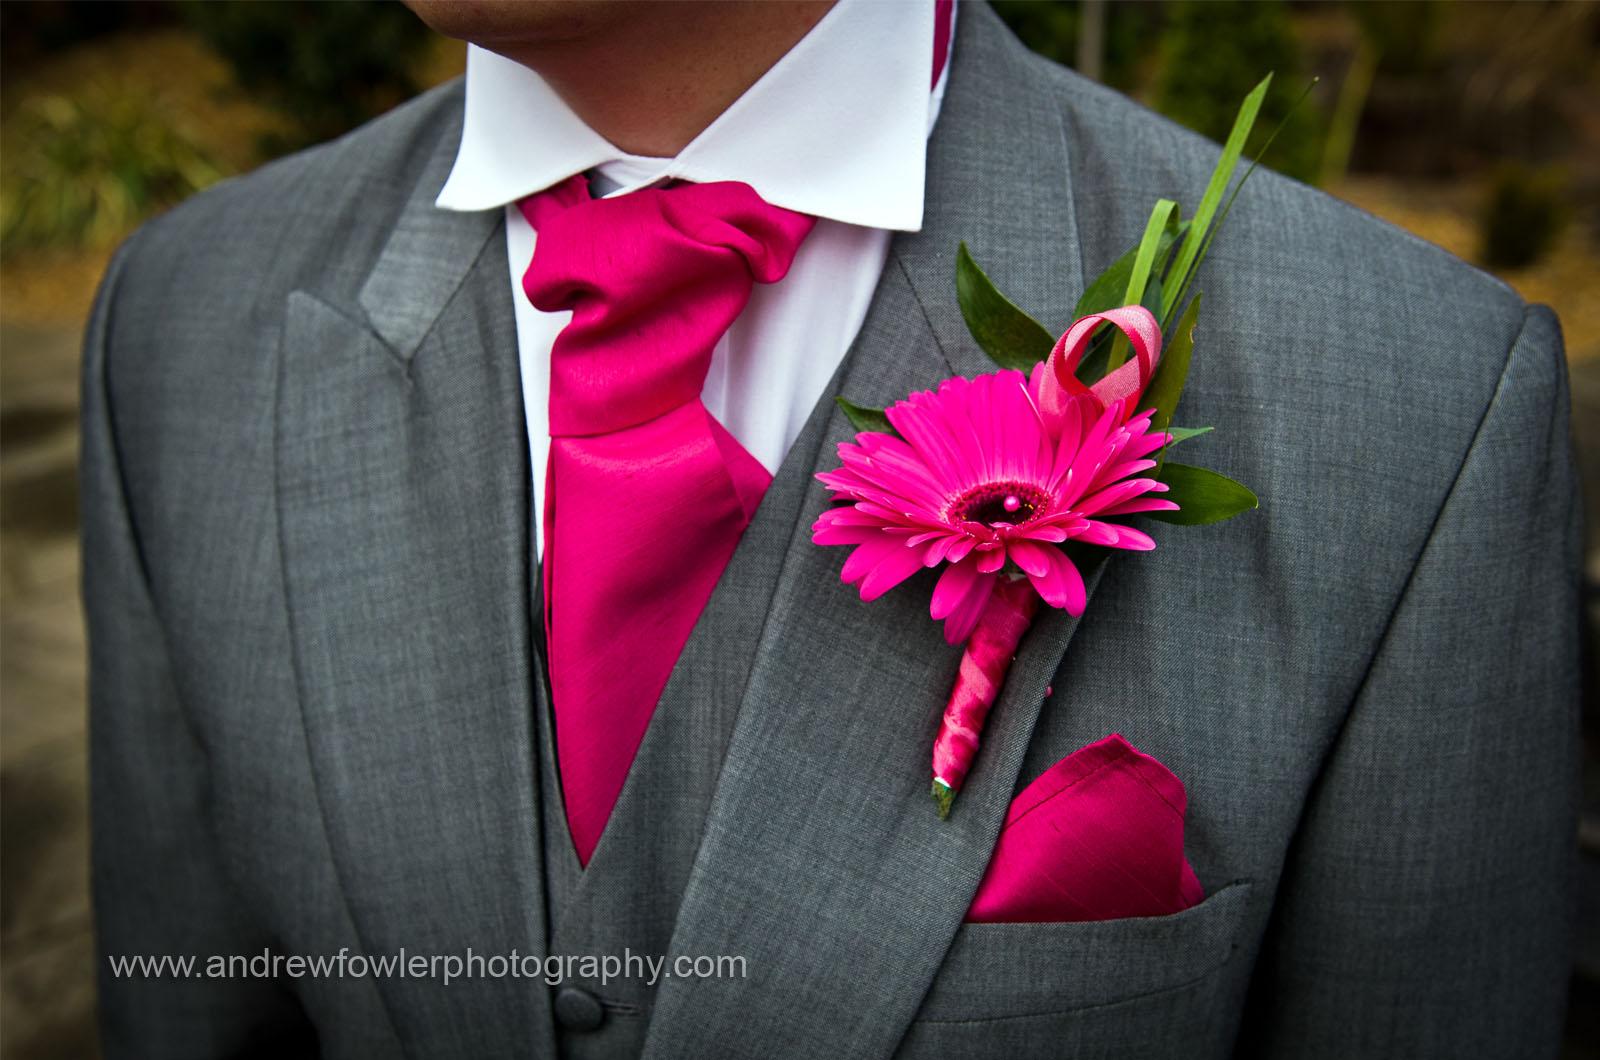 http://4.bp.blogspot.com/-DVE3krIGH_g/TdrRs6TgQDI/AAAAAAAABH0/gZBNuDmIDBA/s1600/Bridge_Inn_Wedding_05.jpg